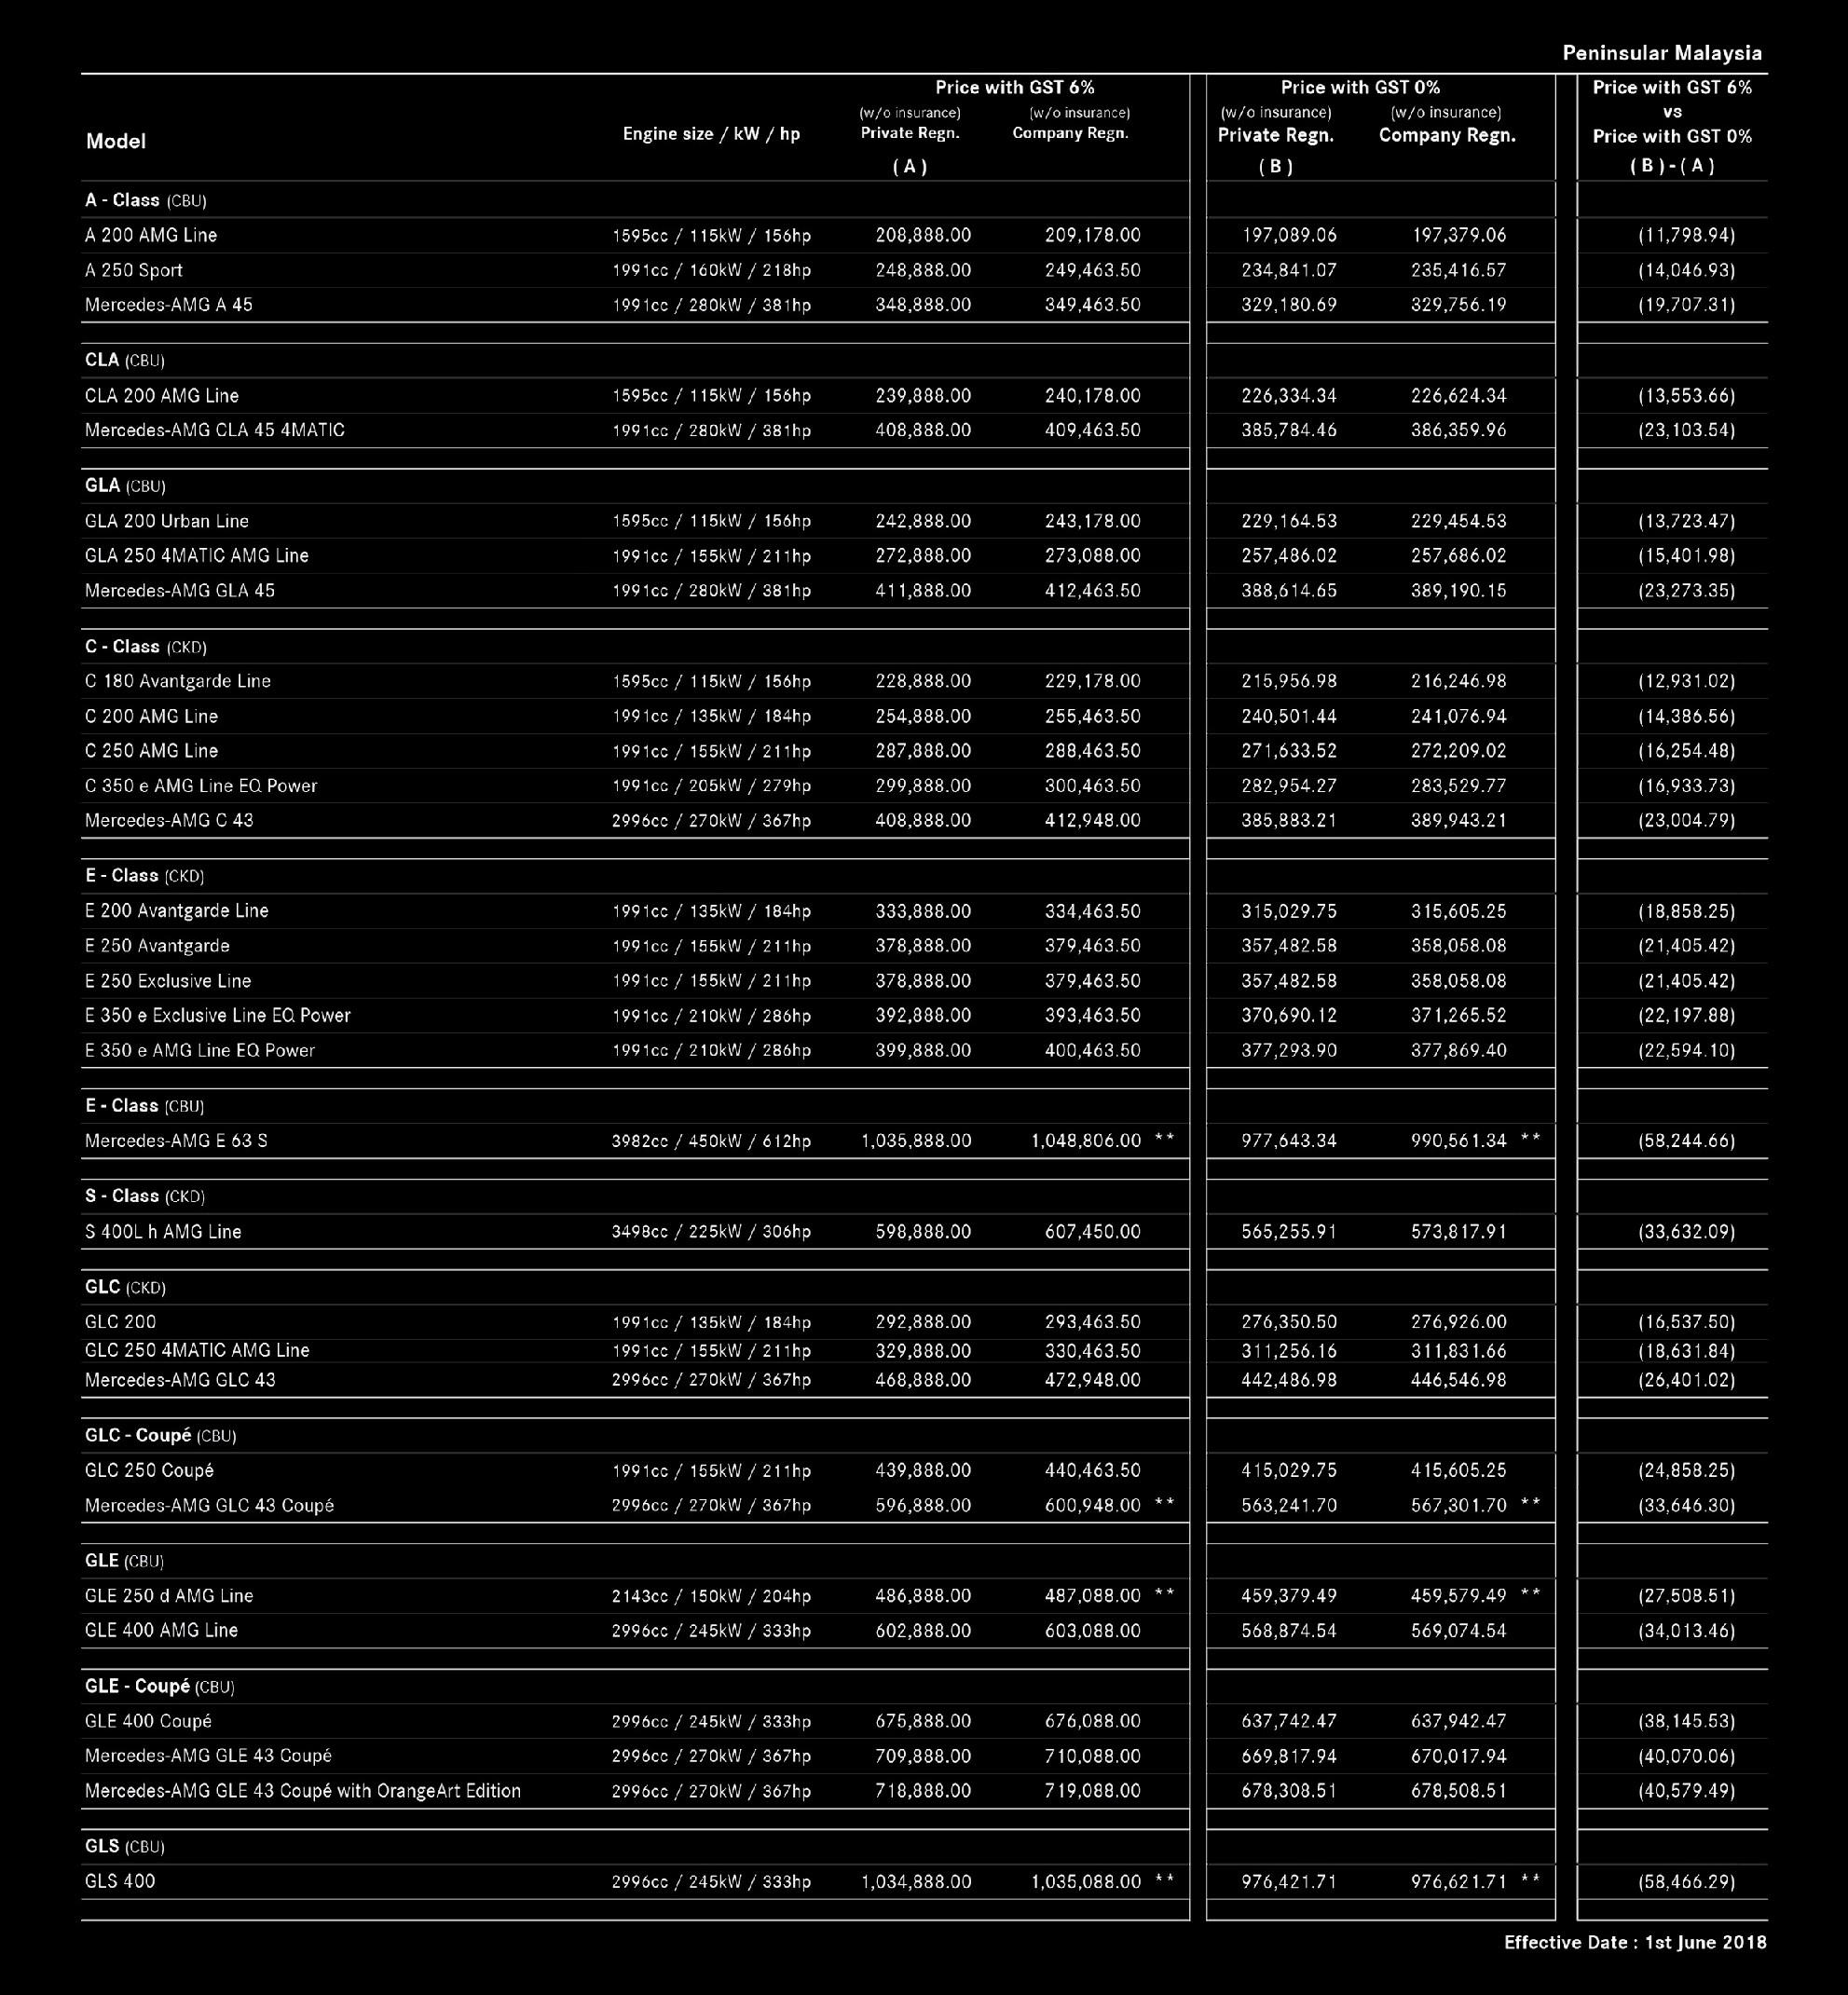 Delightful Mercedes Benz Malaysia June 2018 Price List U2013 Pen Malaysia 1